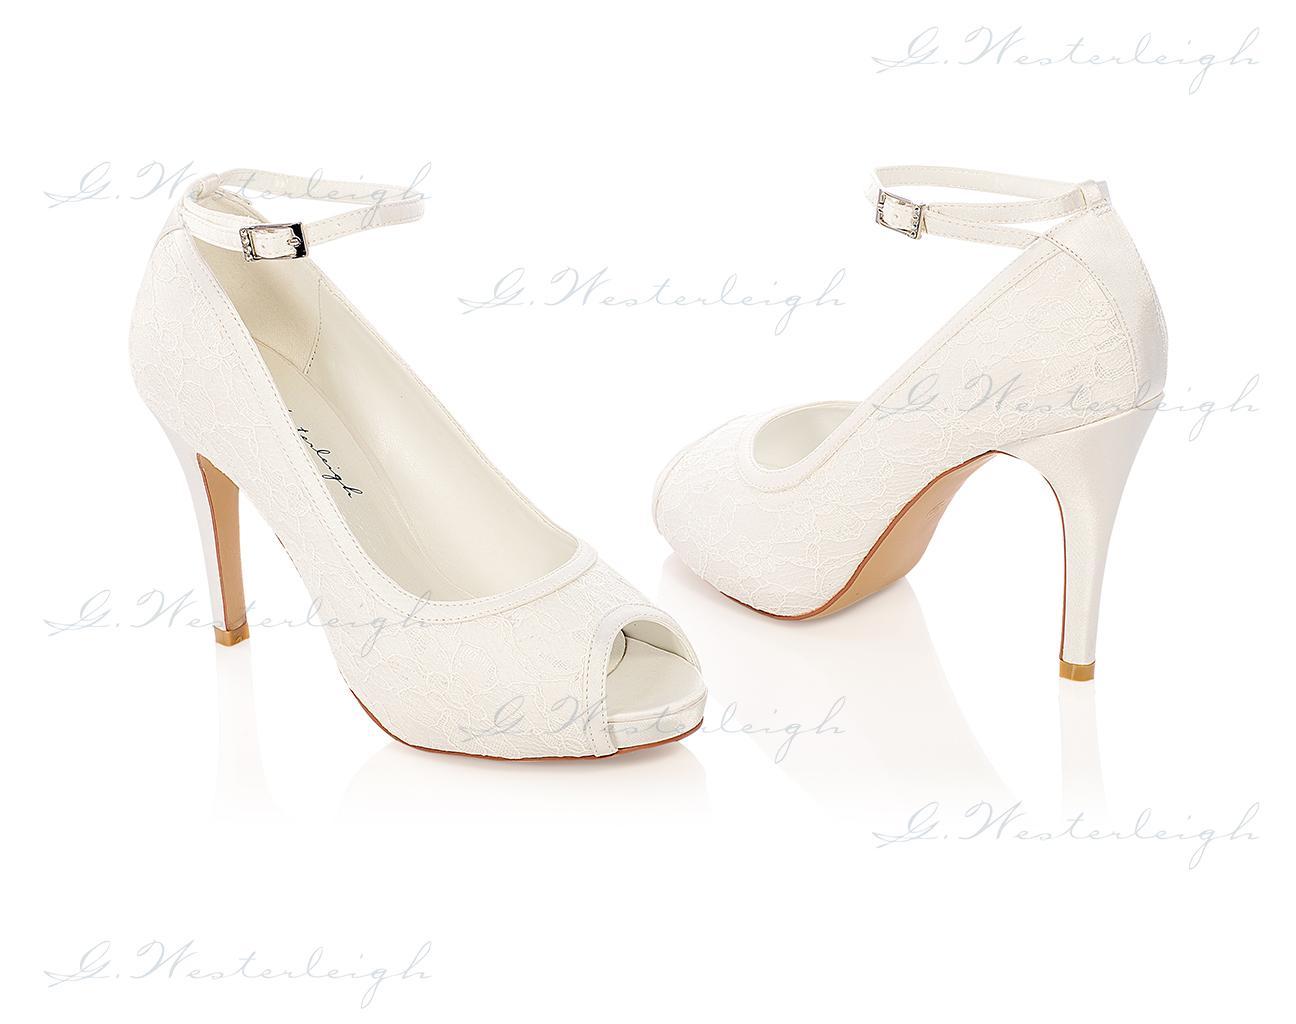 Svadobné topánky s čipkou Leila, veľ. od 35 do 41 - Obrázok č. 1